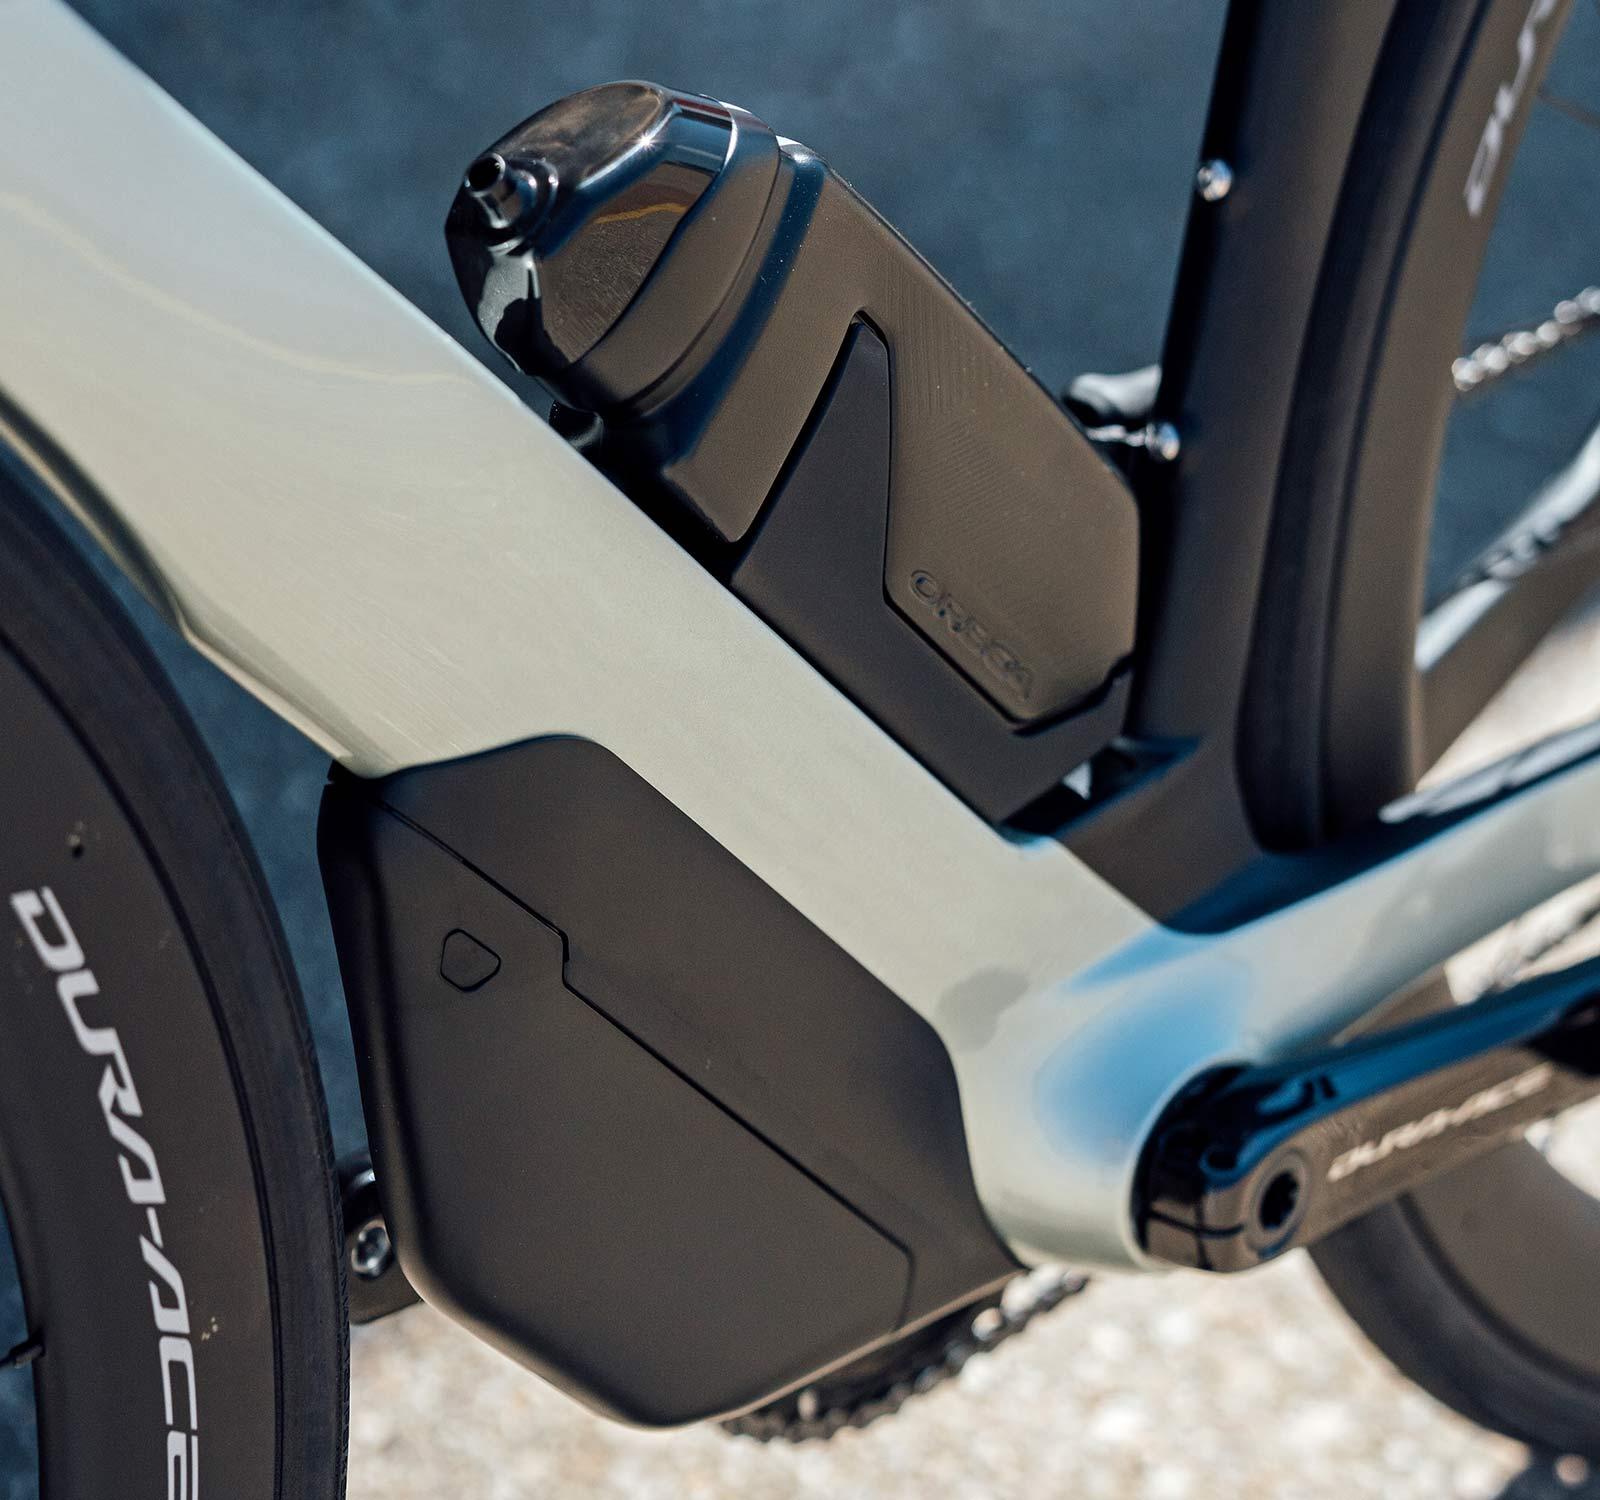 2022 Orbea Orca Aero carbon road bike, toolbox